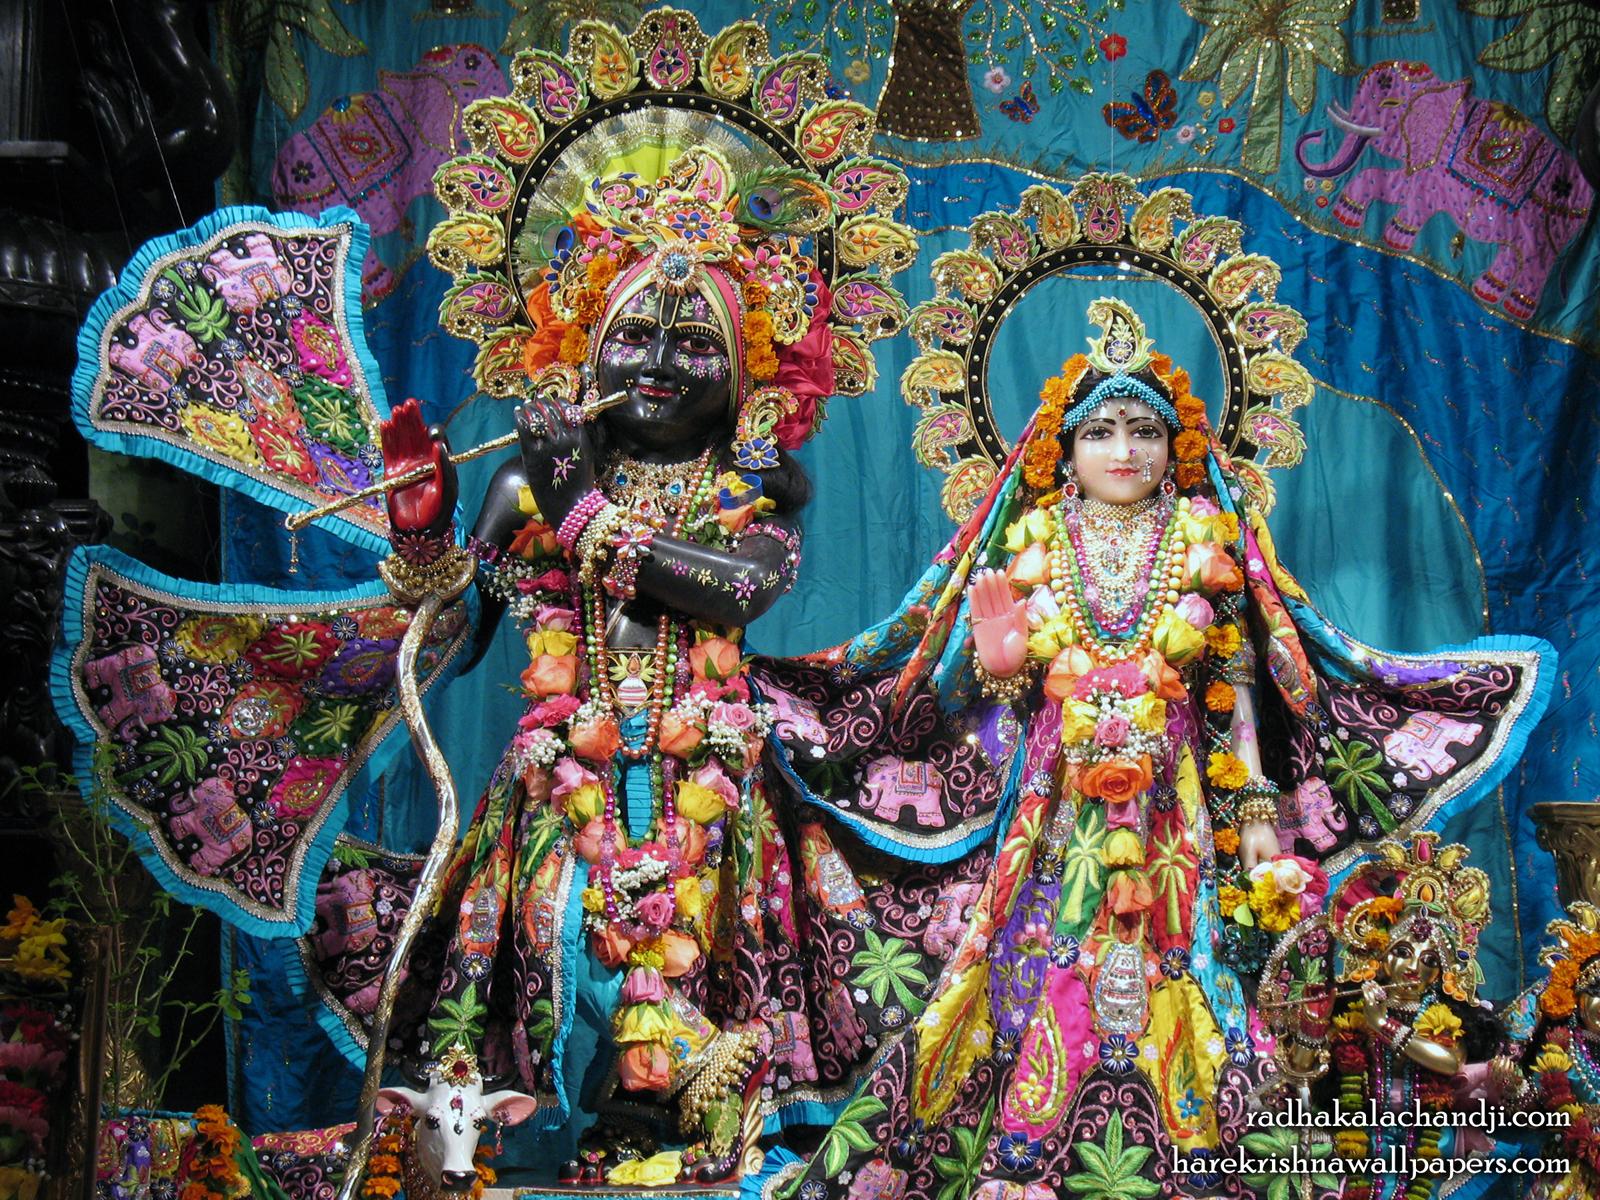 Sri Sri Radha Kalachanda Wallpaper (005) Size1600x1200 Download